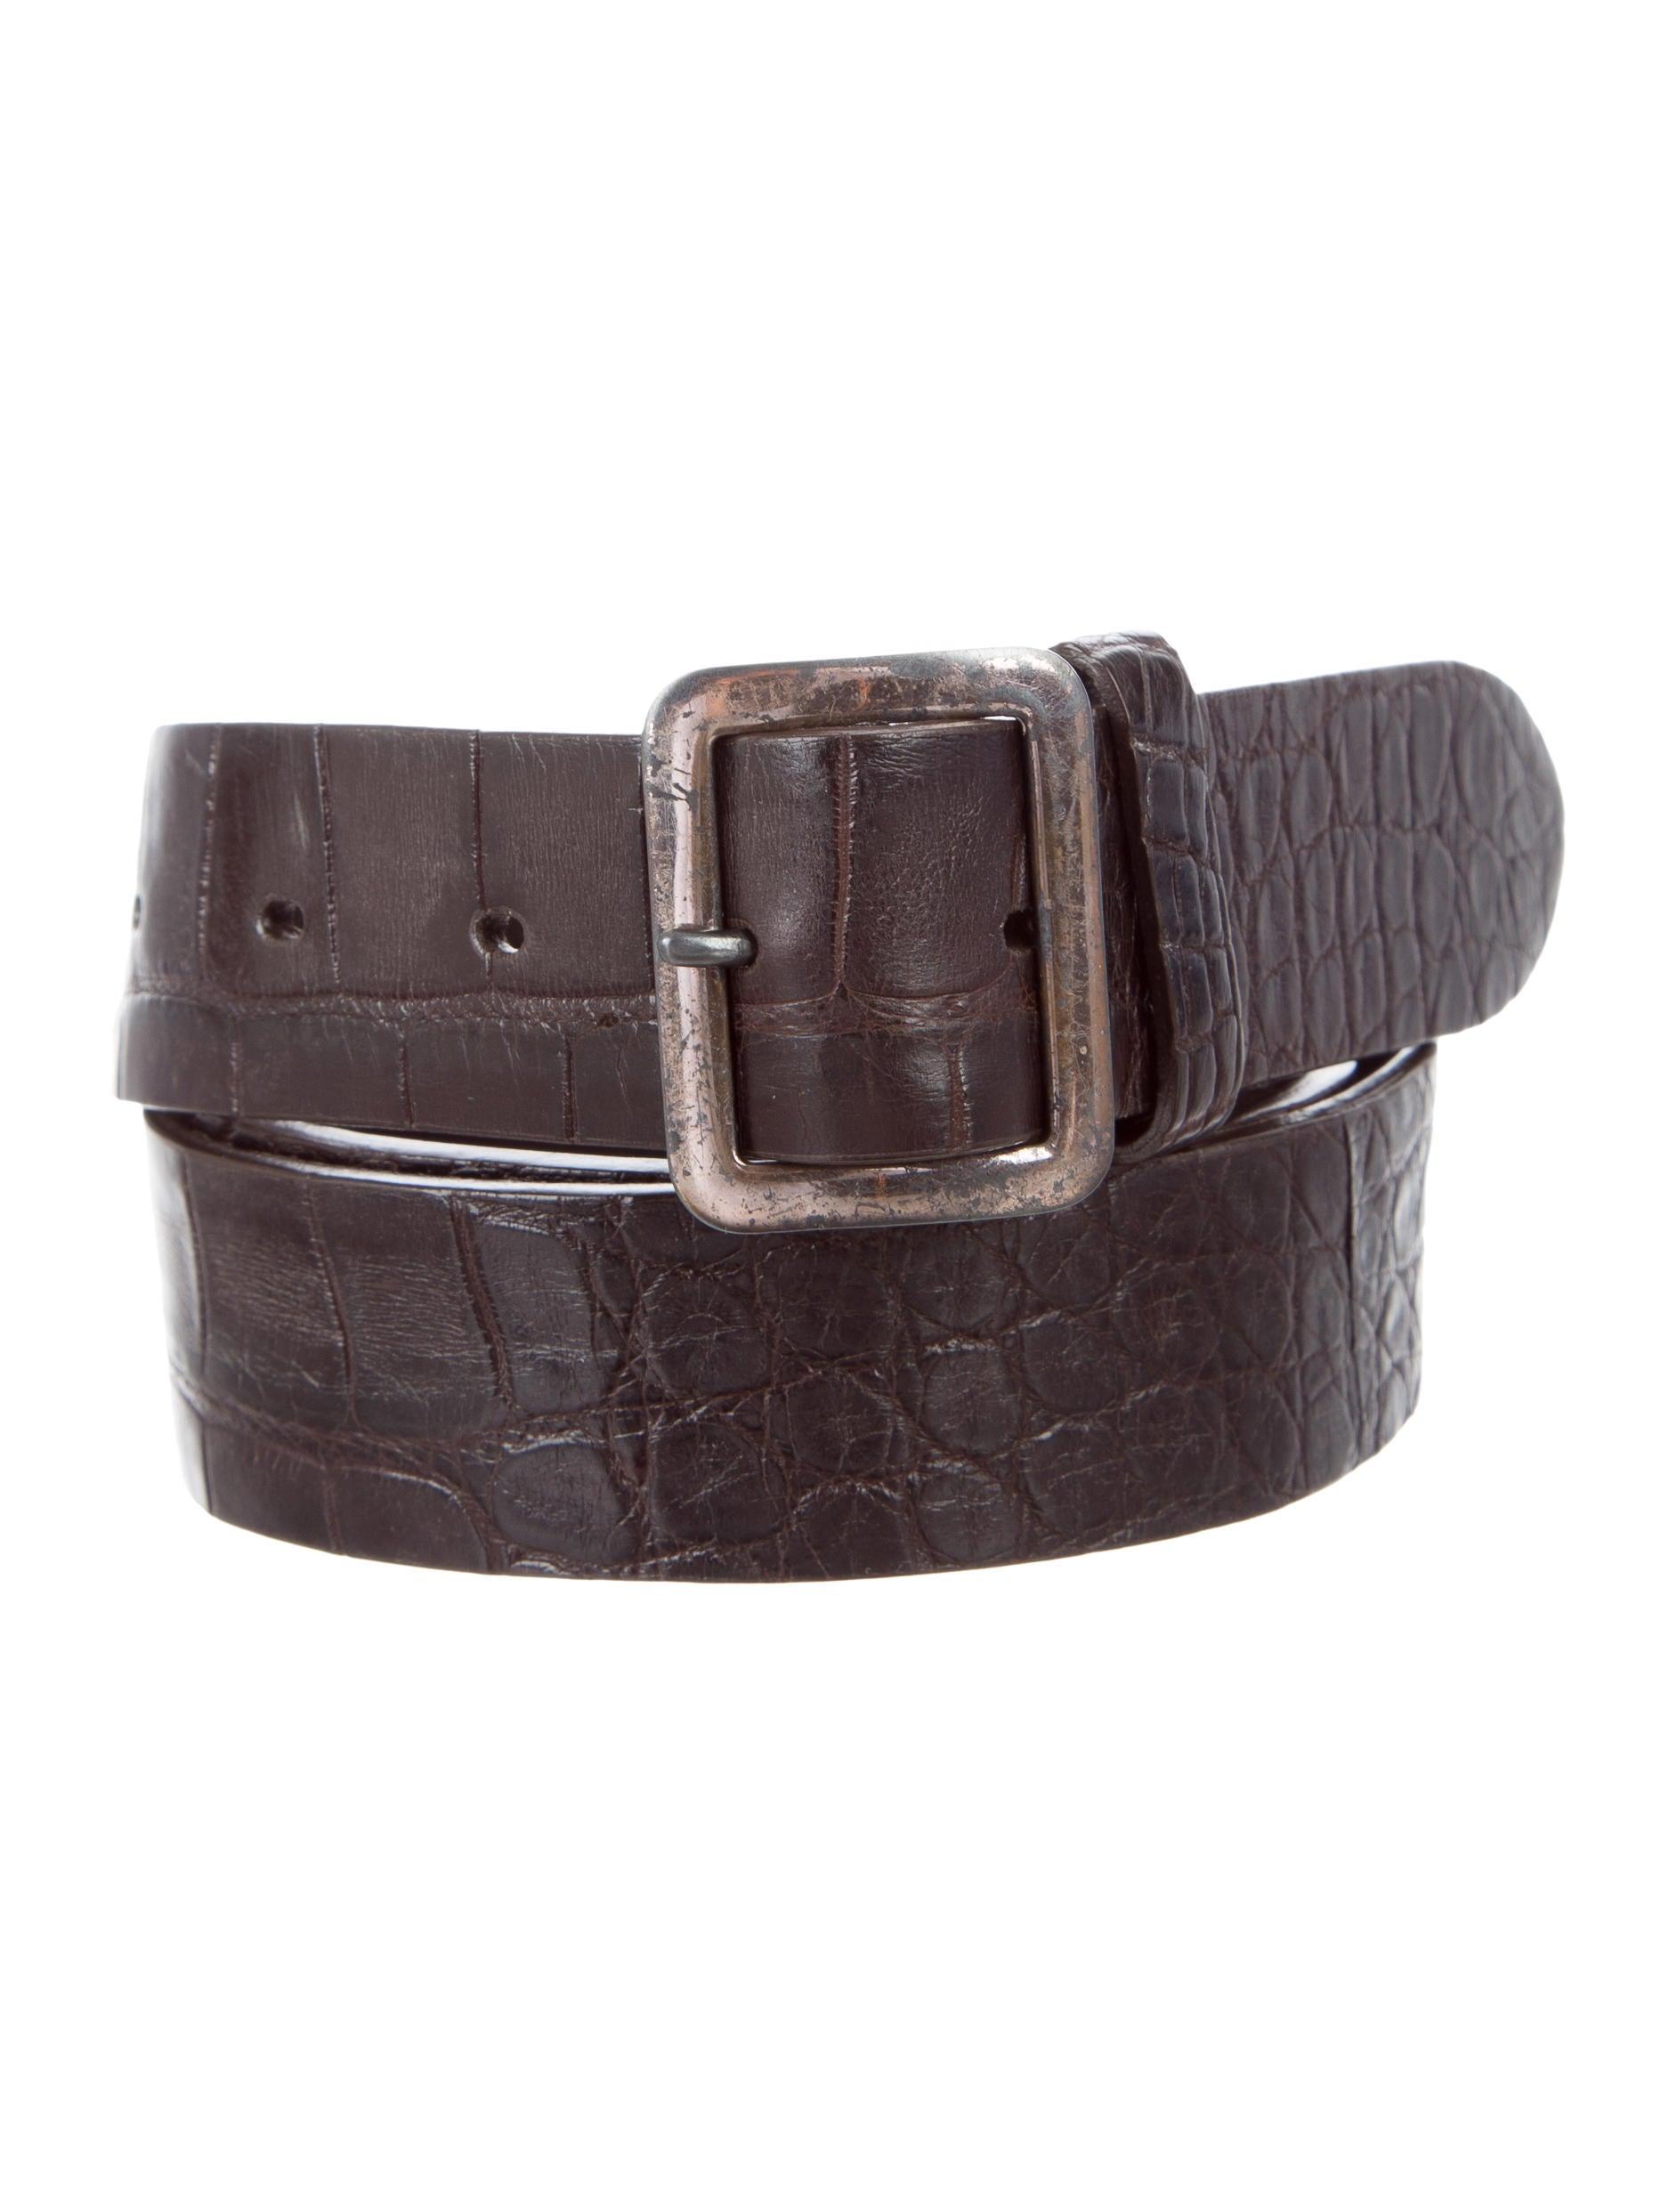 ralph lauren alligator skin belt accessories wyg22620. Black Bedroom Furniture Sets. Home Design Ideas